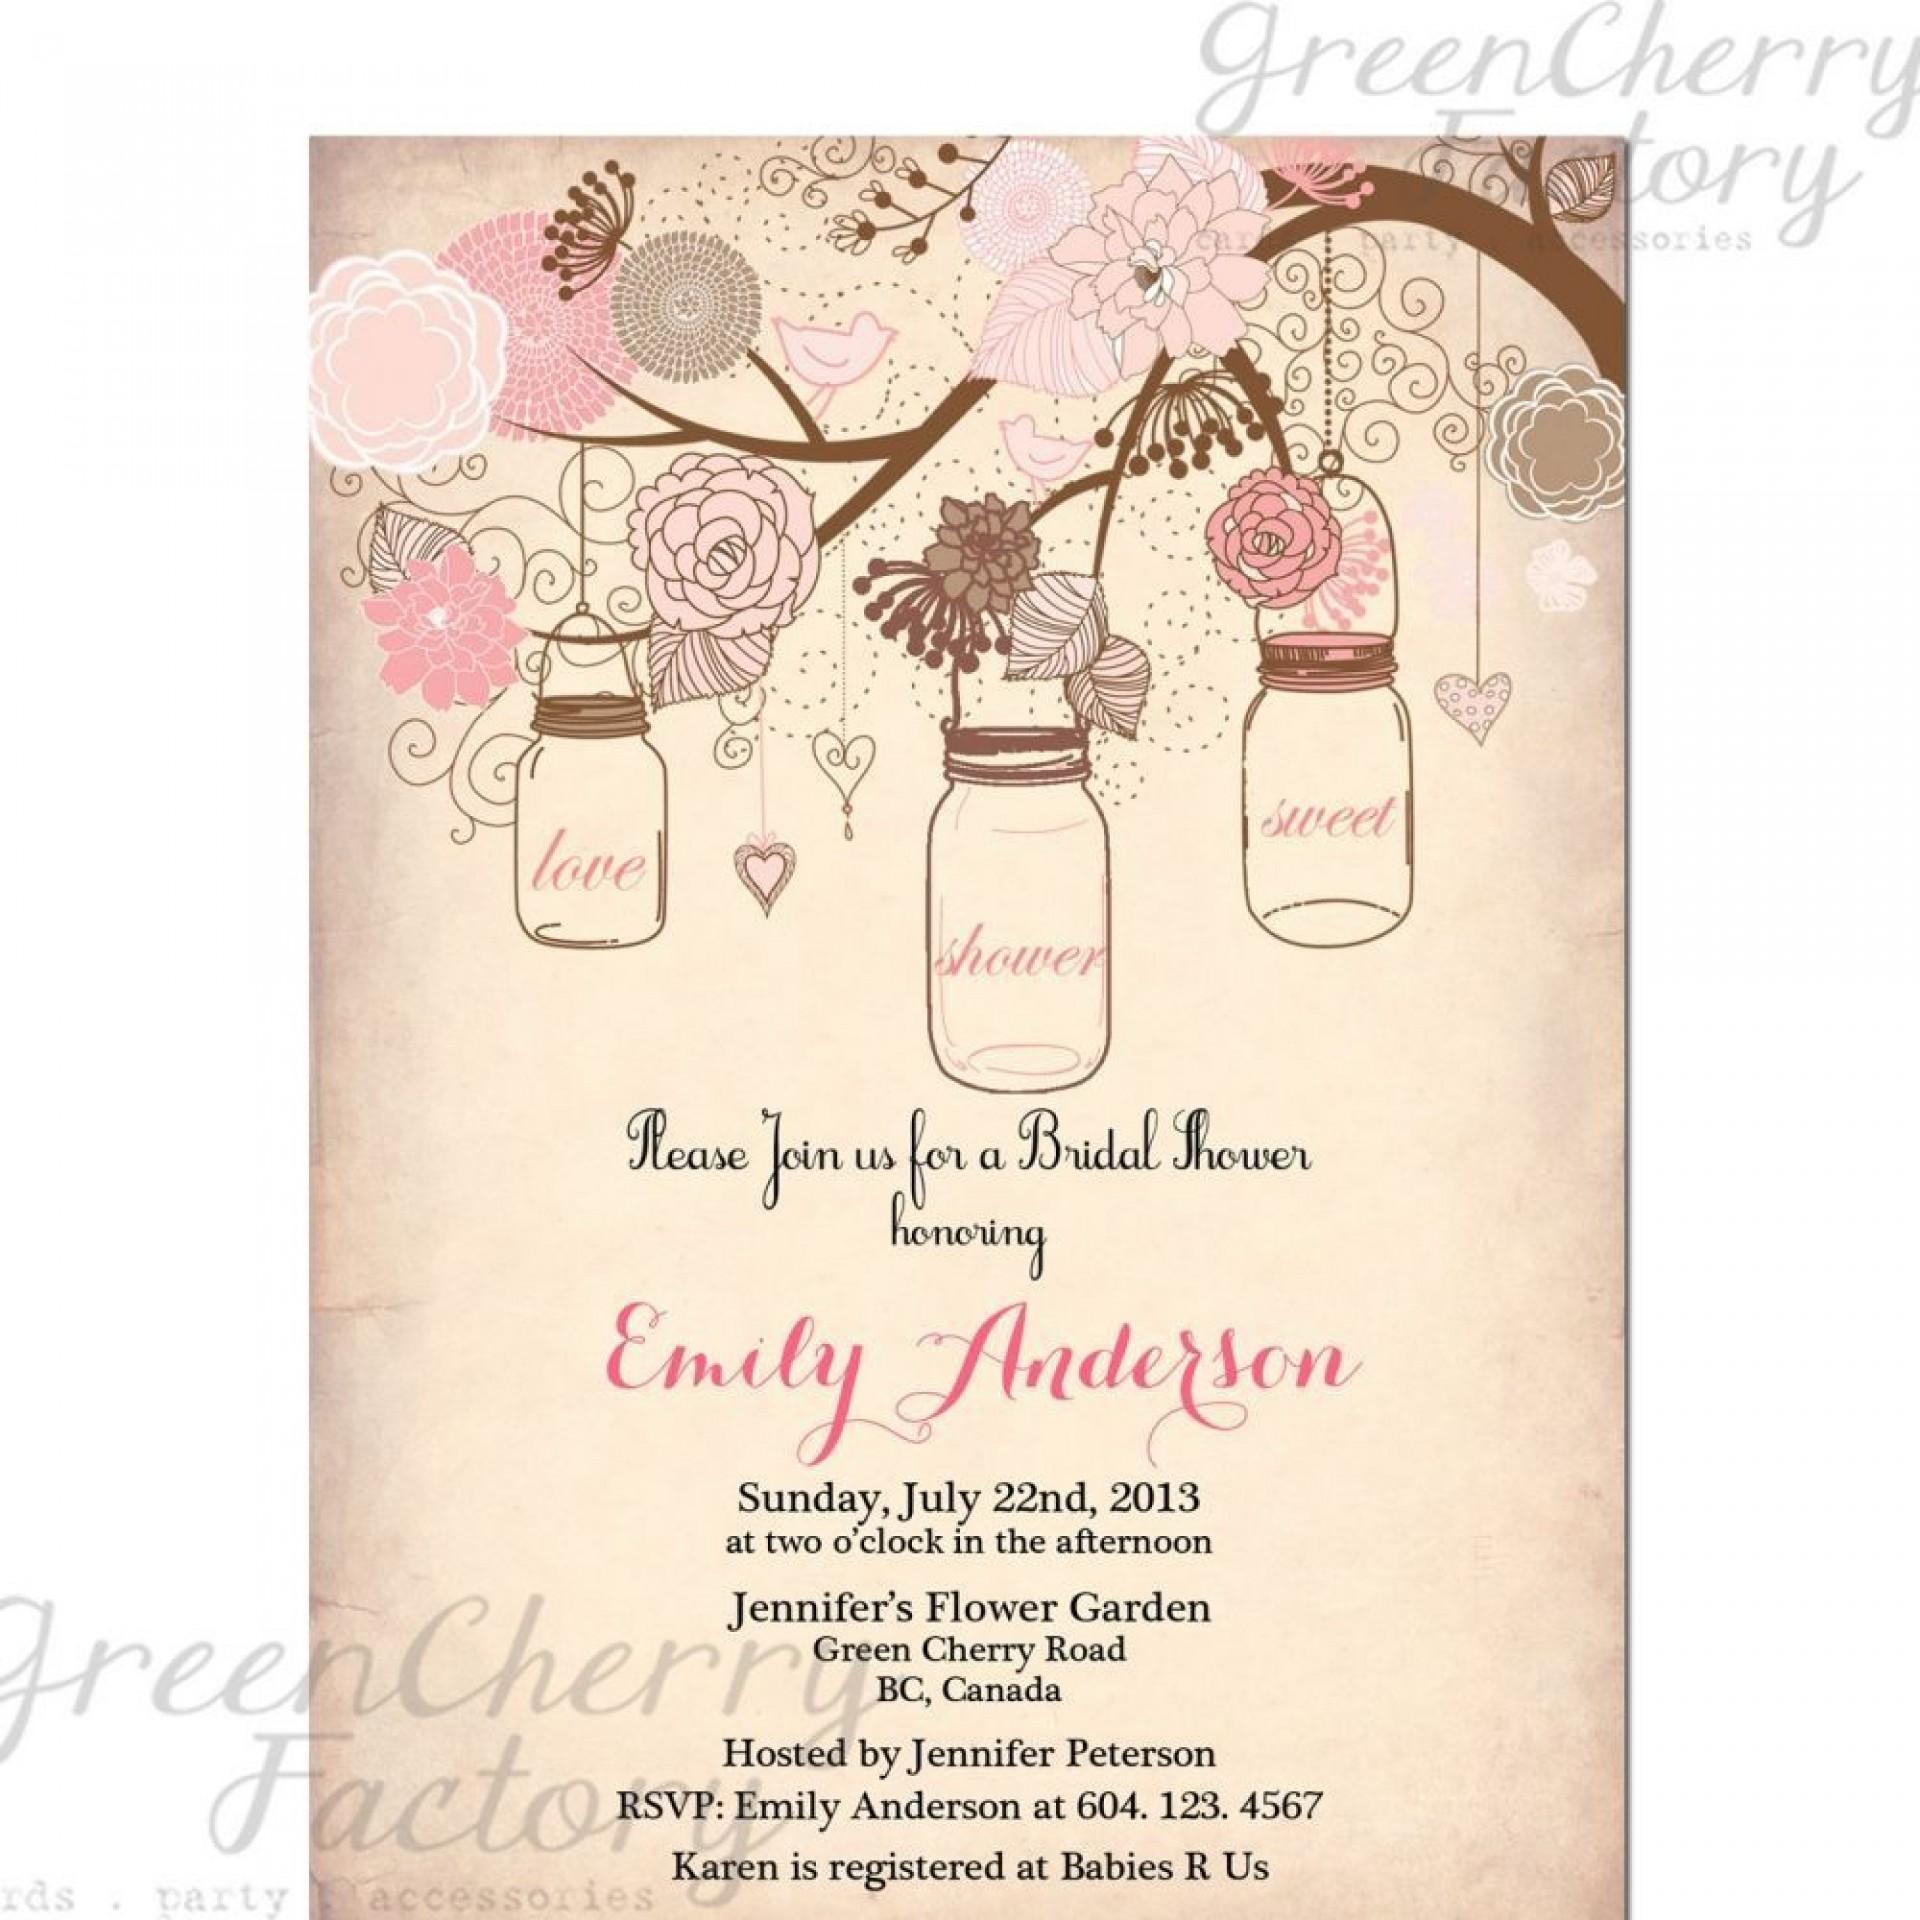 005 Breathtaking Free Bridal Shower Invite Template Sample  Invitation For Word Wedding Microsoft1920